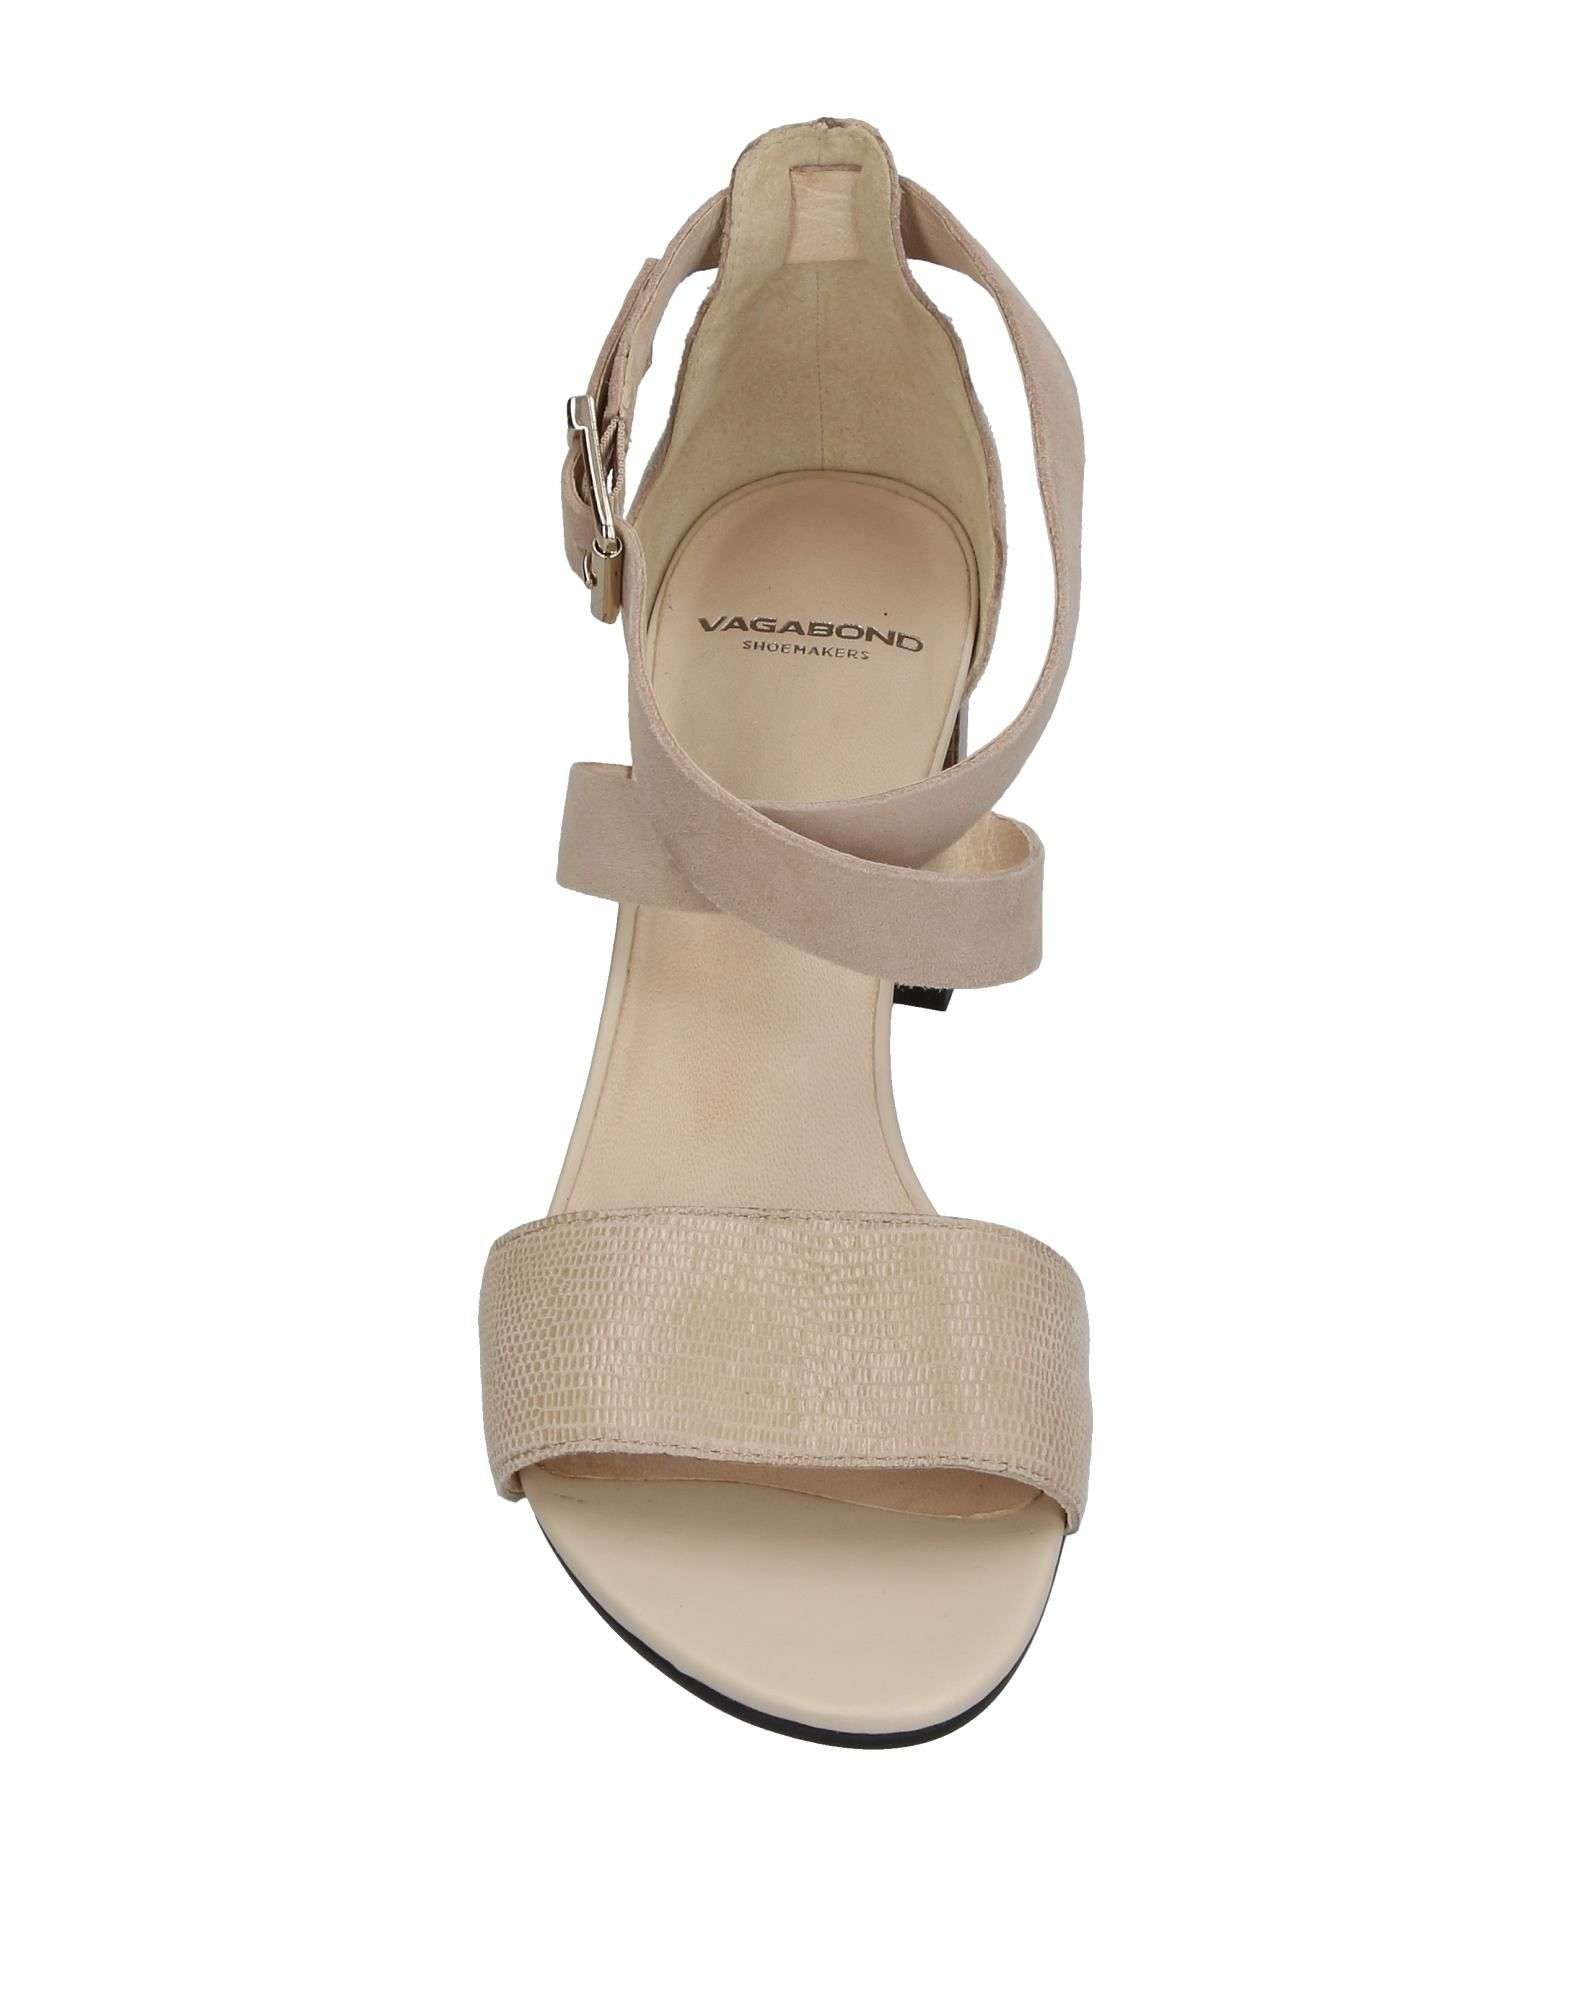 Vagabond Shoemakers Sandalen Damen  11369802MF